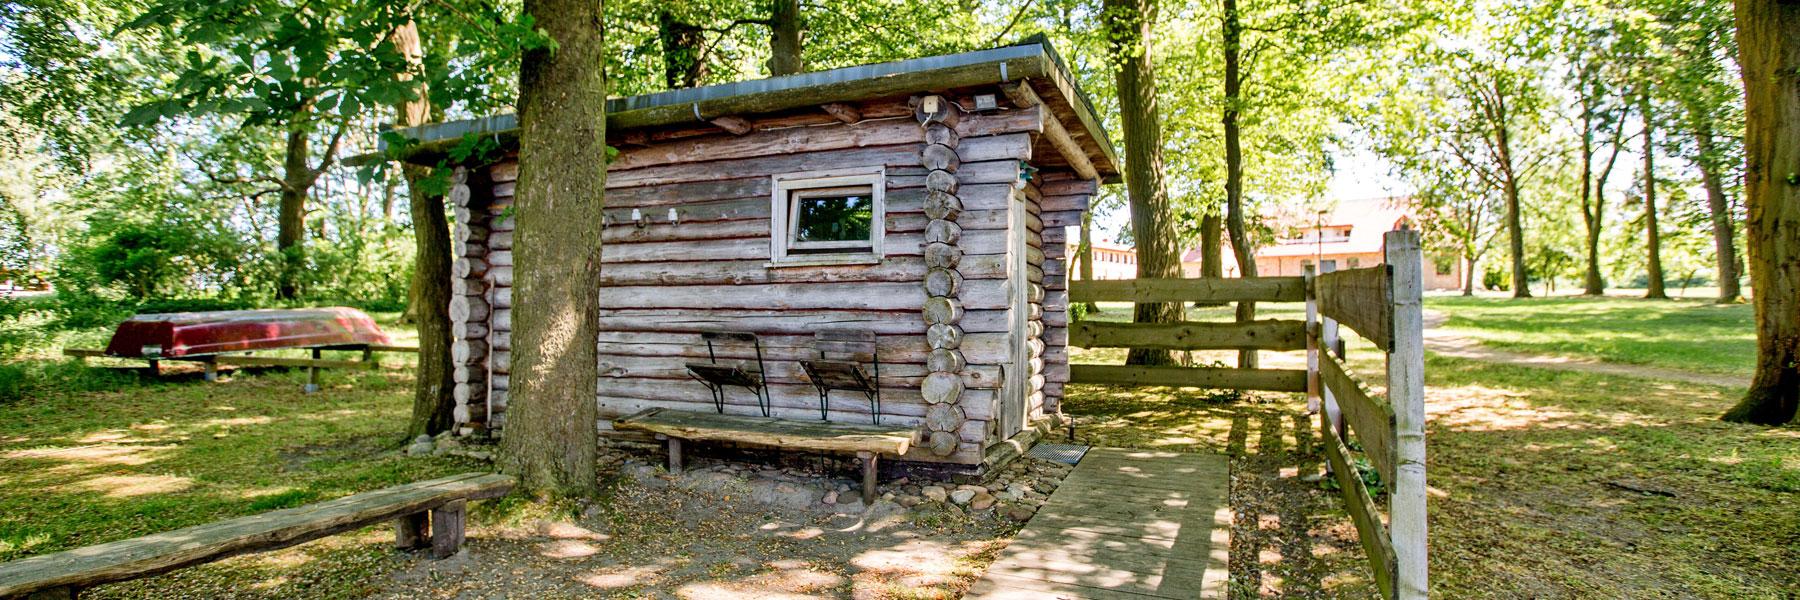 Sauna - Gästehaus BärenHof